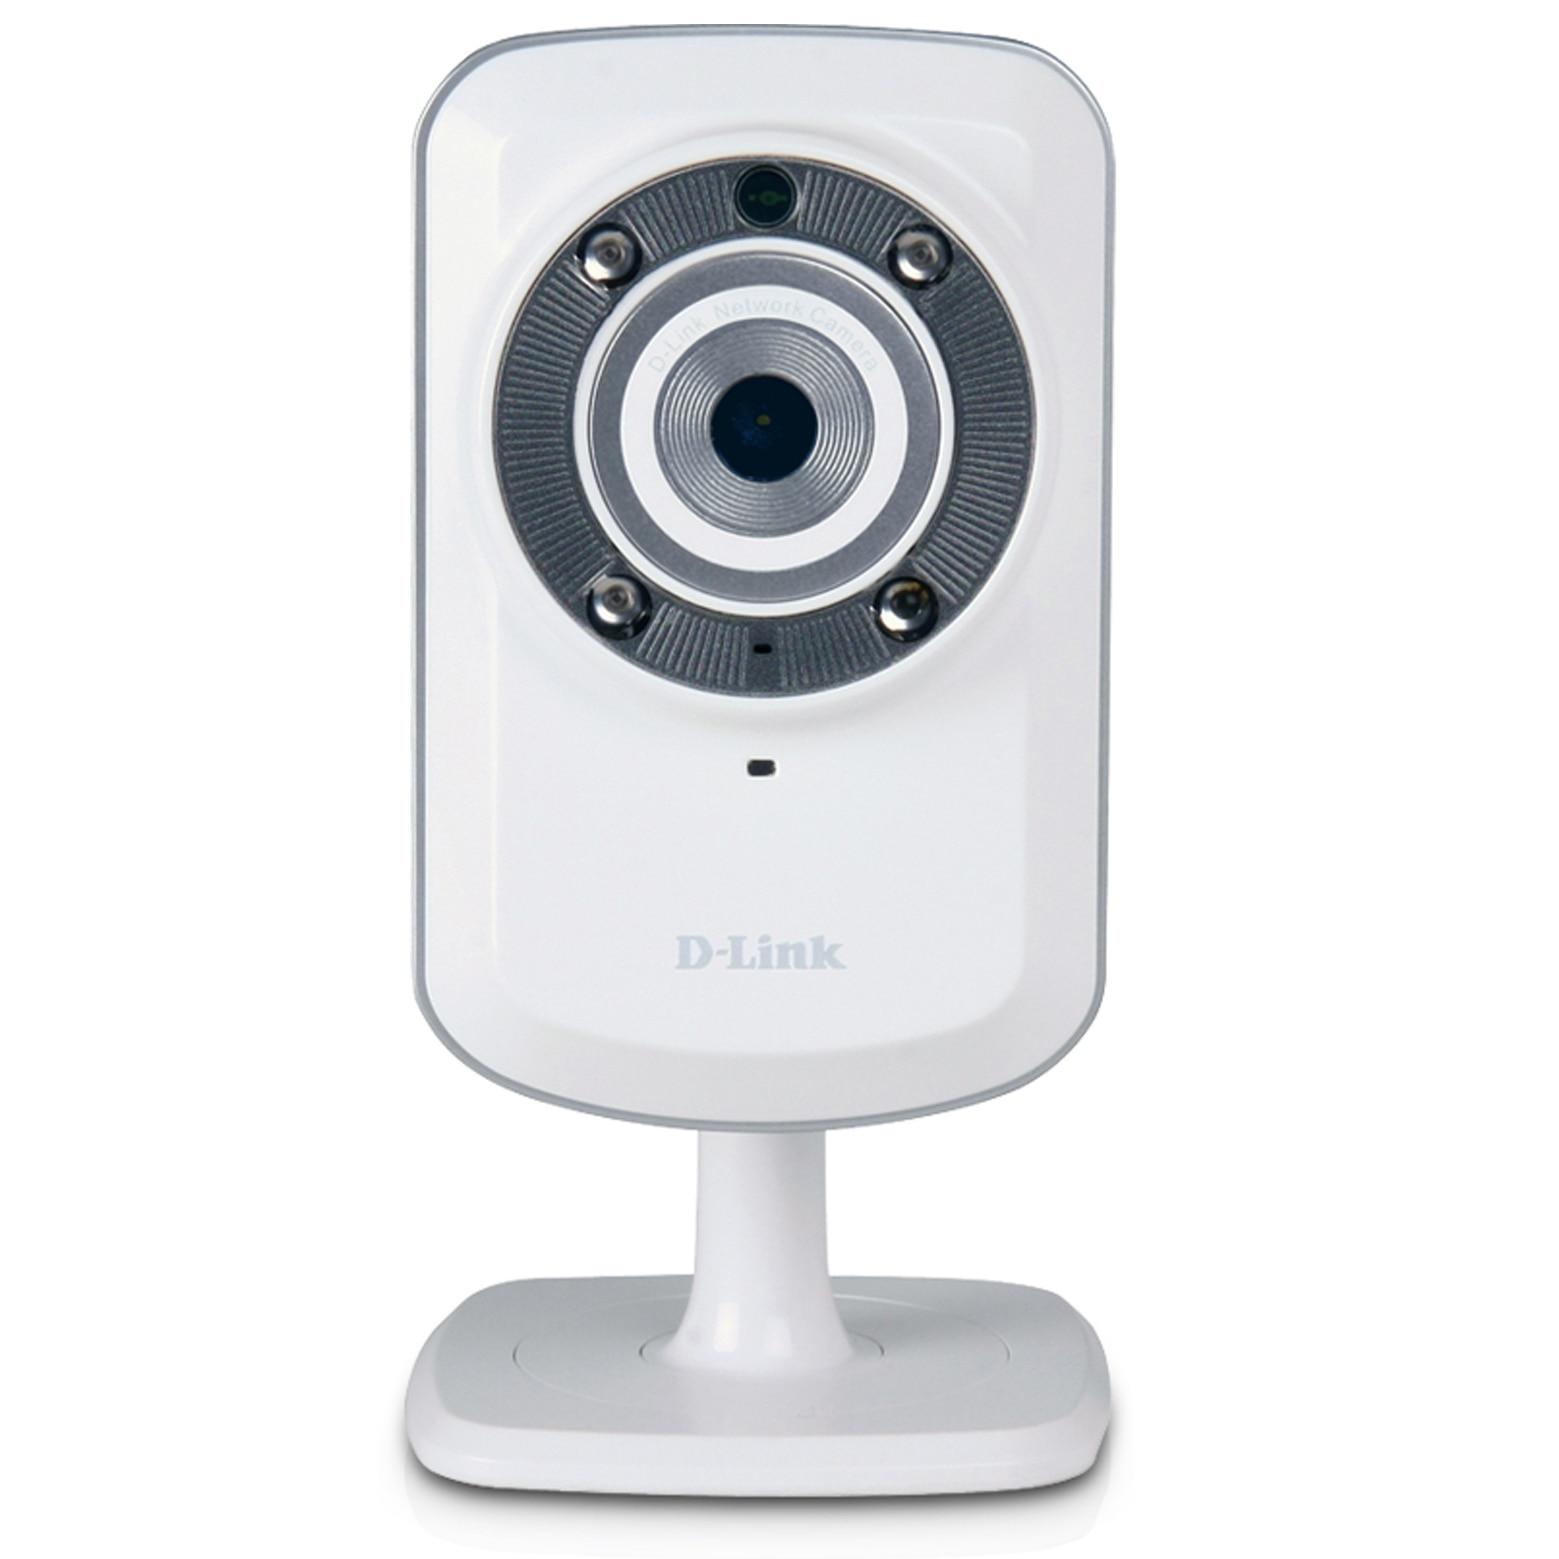 Fotografie Camera IP D-LINK DCS-932L, WIRELESS N, WPS, INFRARED